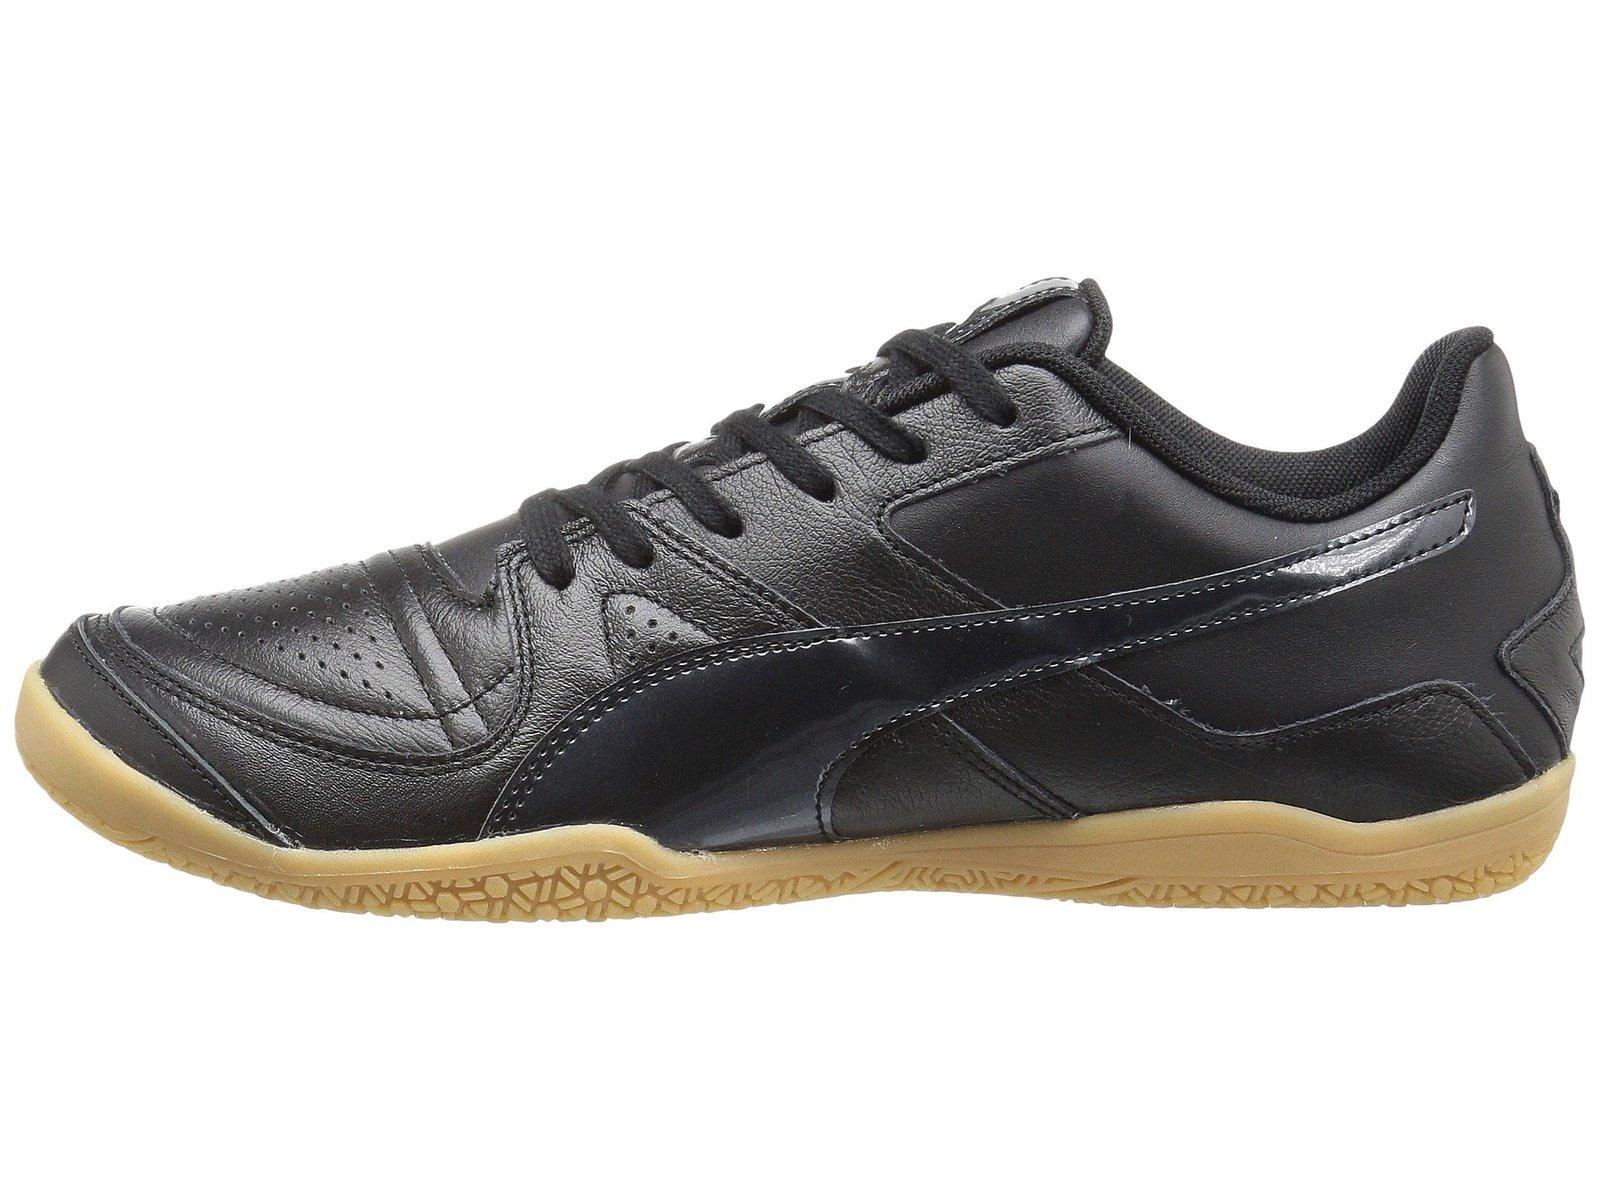 3325cb4b9 81fijvvrzml. 81fijvvrzml. Previous. Puma Invicto Made in Japan Kangaroo  Leather Indoor Soccer Shoes Black ...